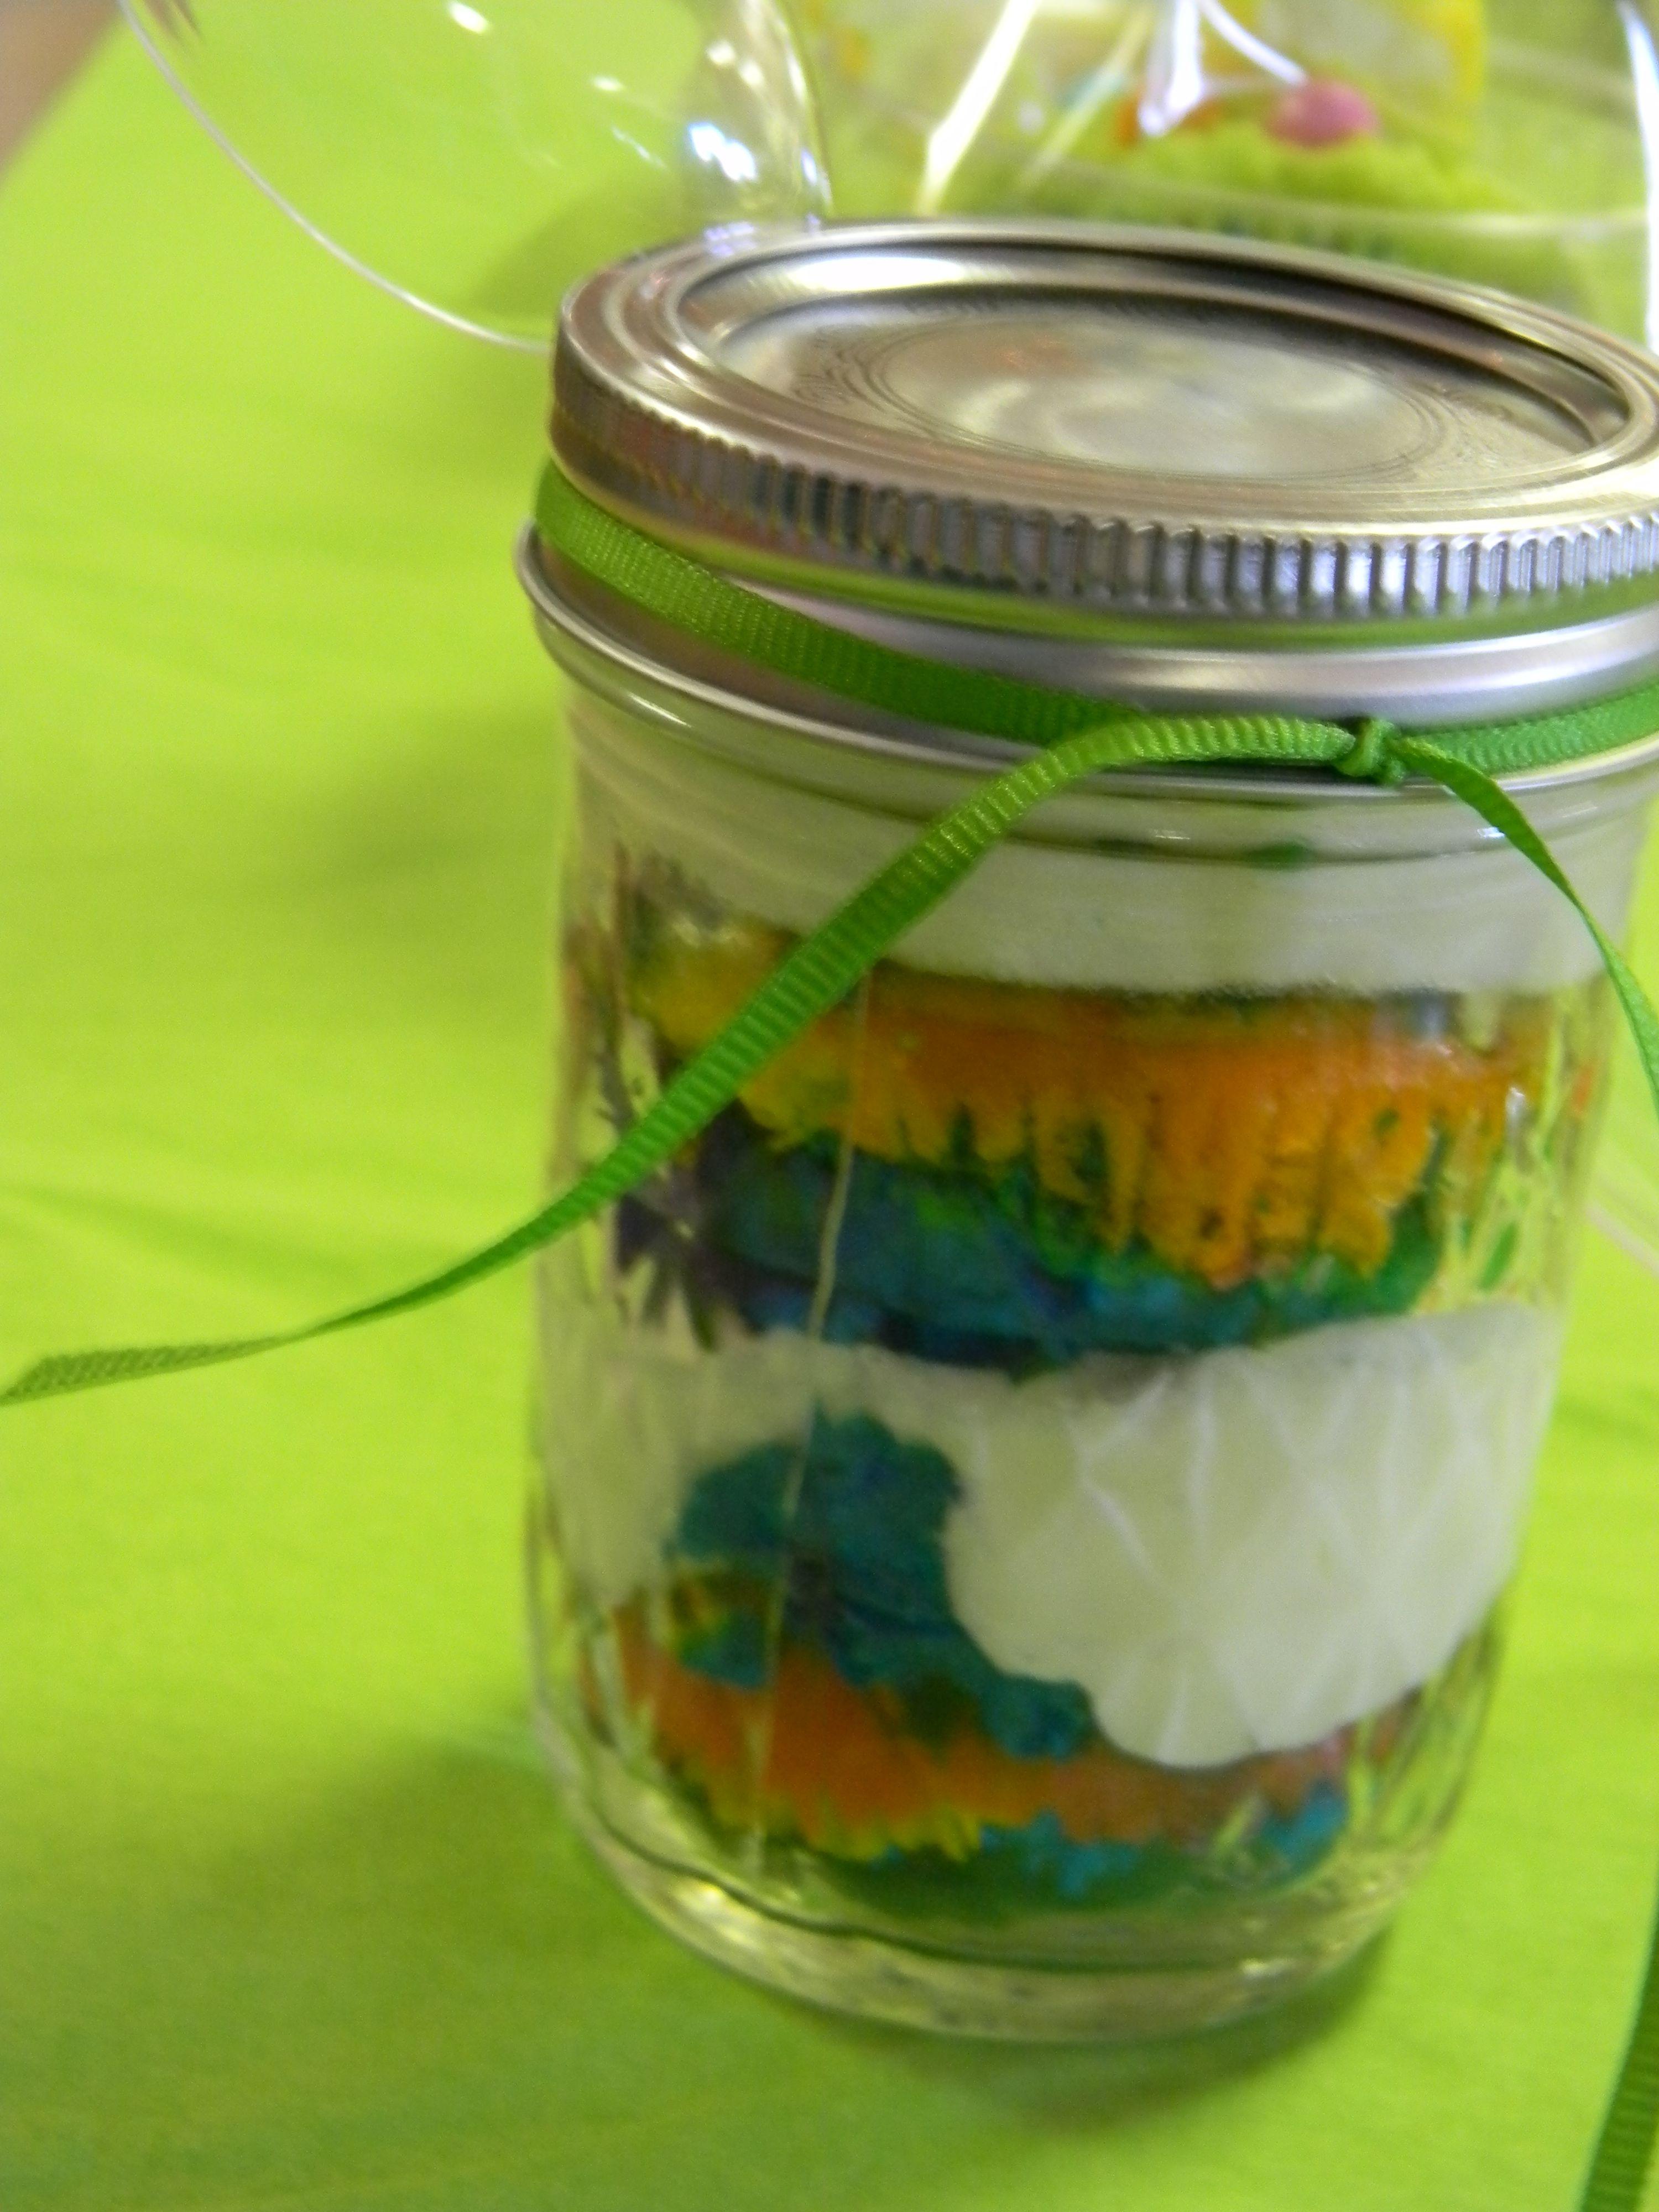 double rainbow cupcake in a jar | Cupcake Creations | Pinterest